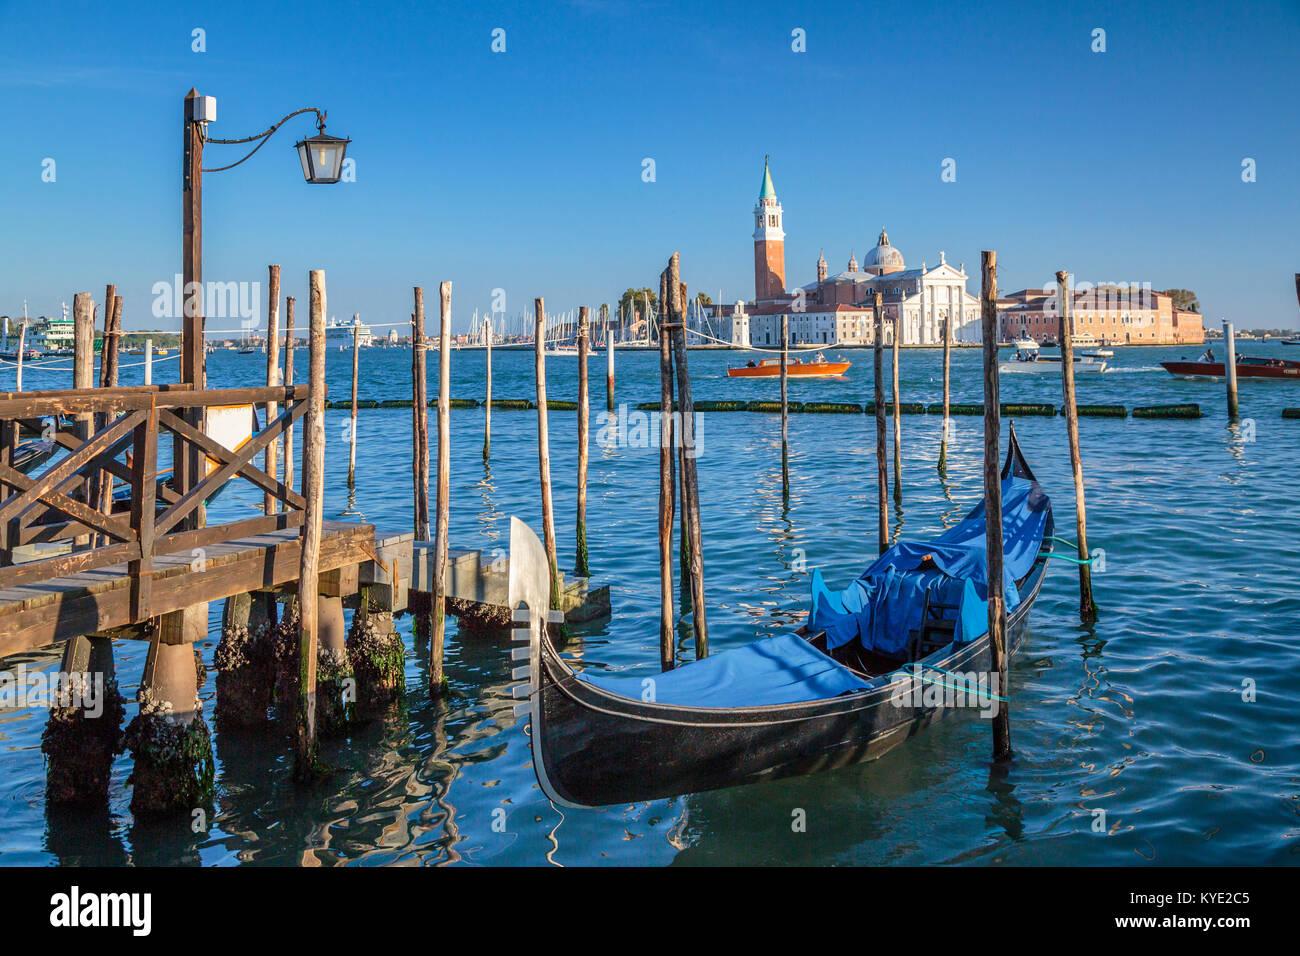 Góndolas aparcadas y la iglesia de San Giorgio Maggiore en Veneto, Venecia, Italia, Europa Foto de stock